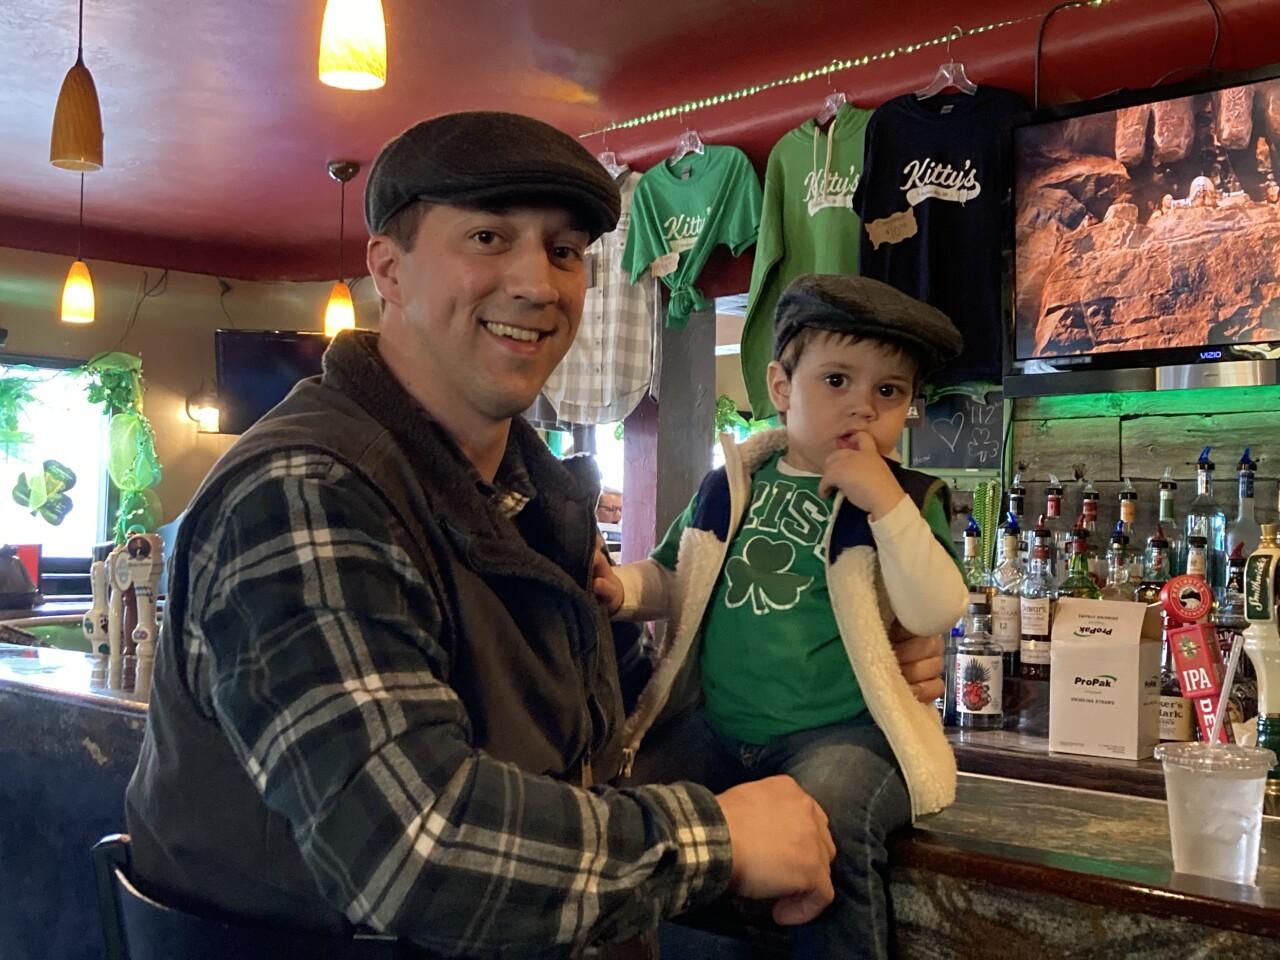 Father son celebrate St. Patrick's Day